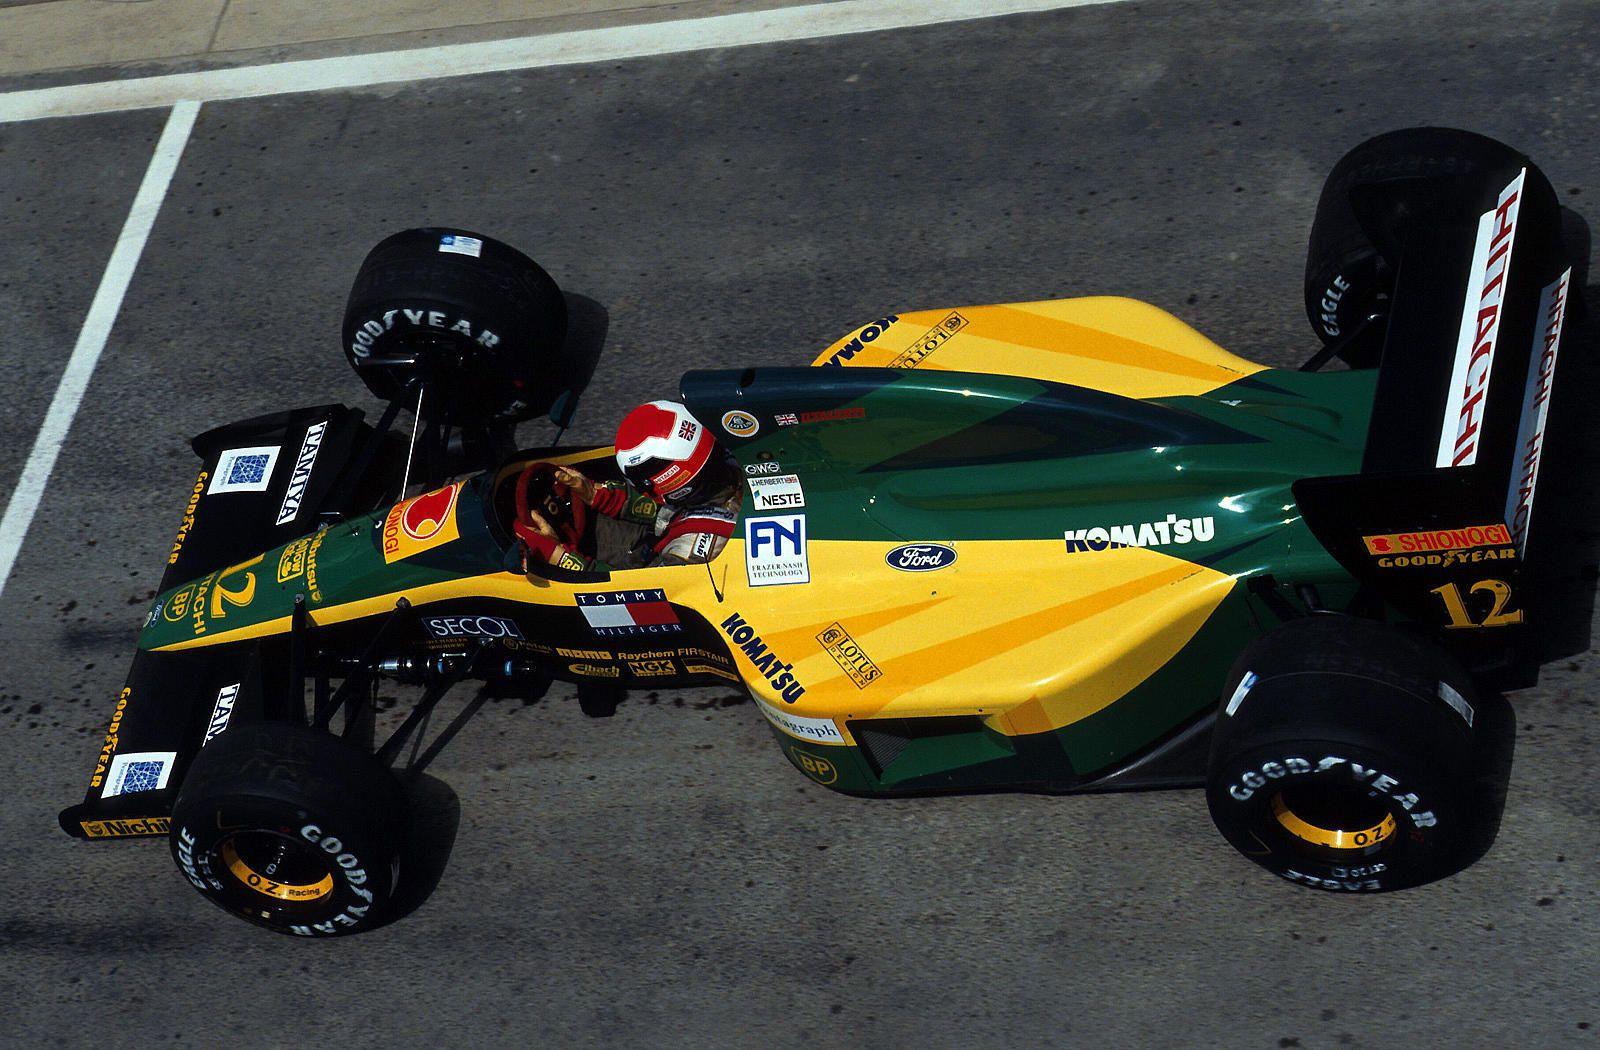 Populares F1 lotus, Fórmula 1, Gran premio